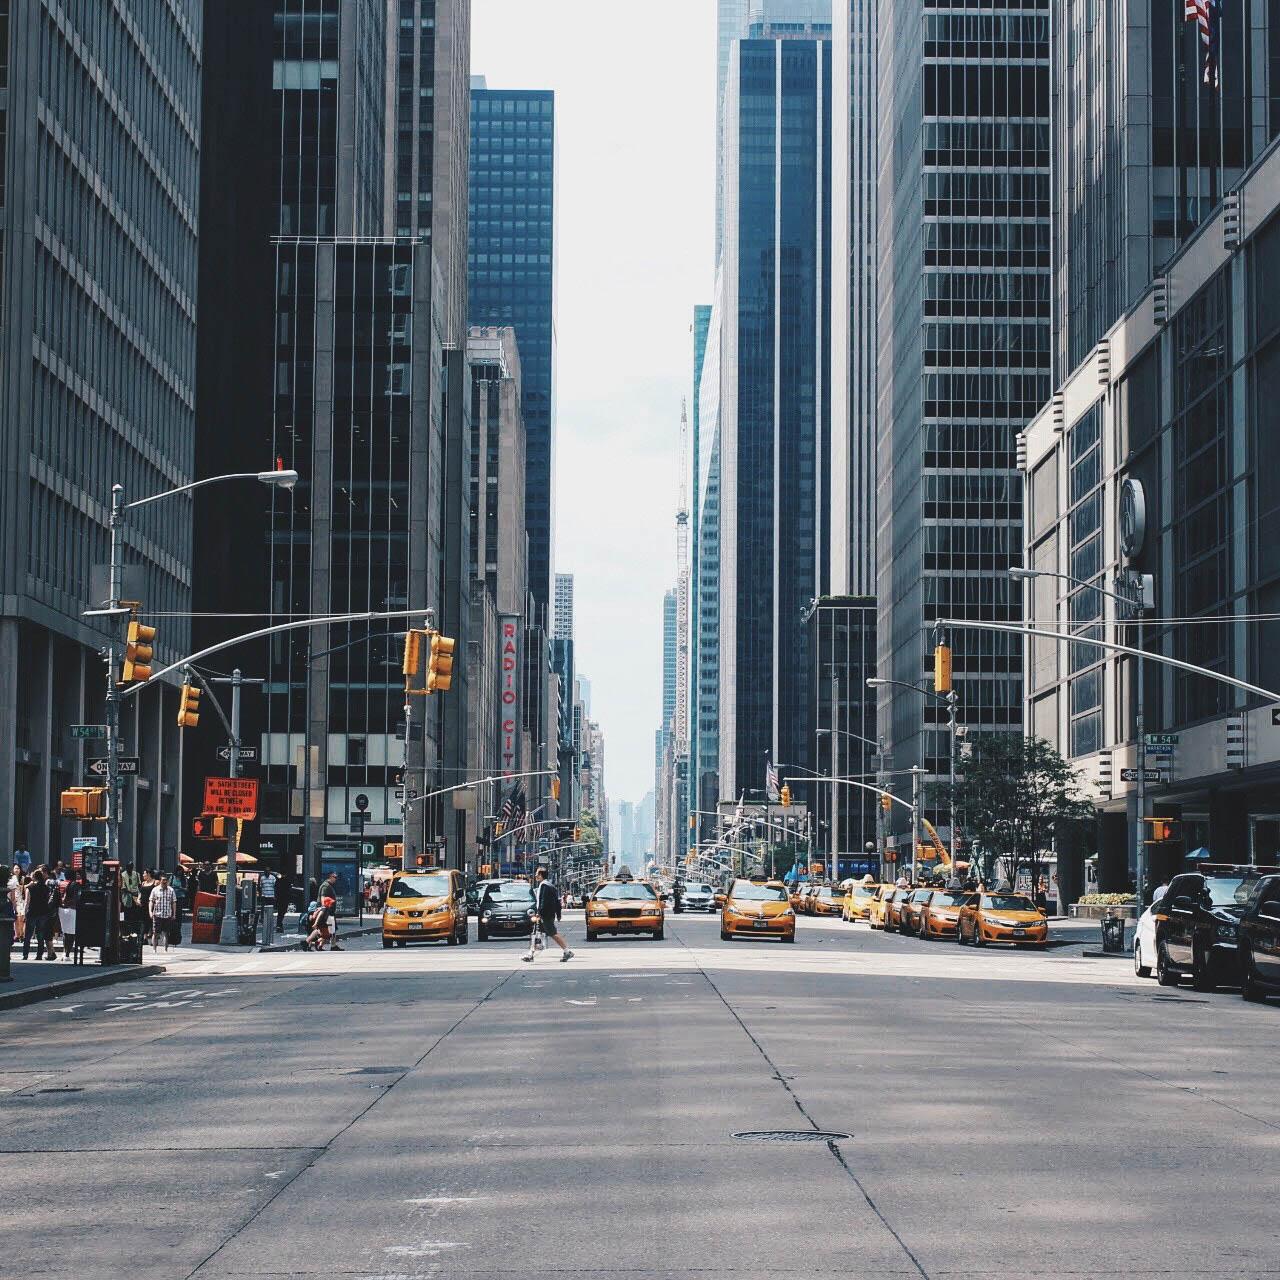 Taxifahren in New York suelovesnyc_susan_fengler_blog_new_york_taxifahren_in_new_york_taxi